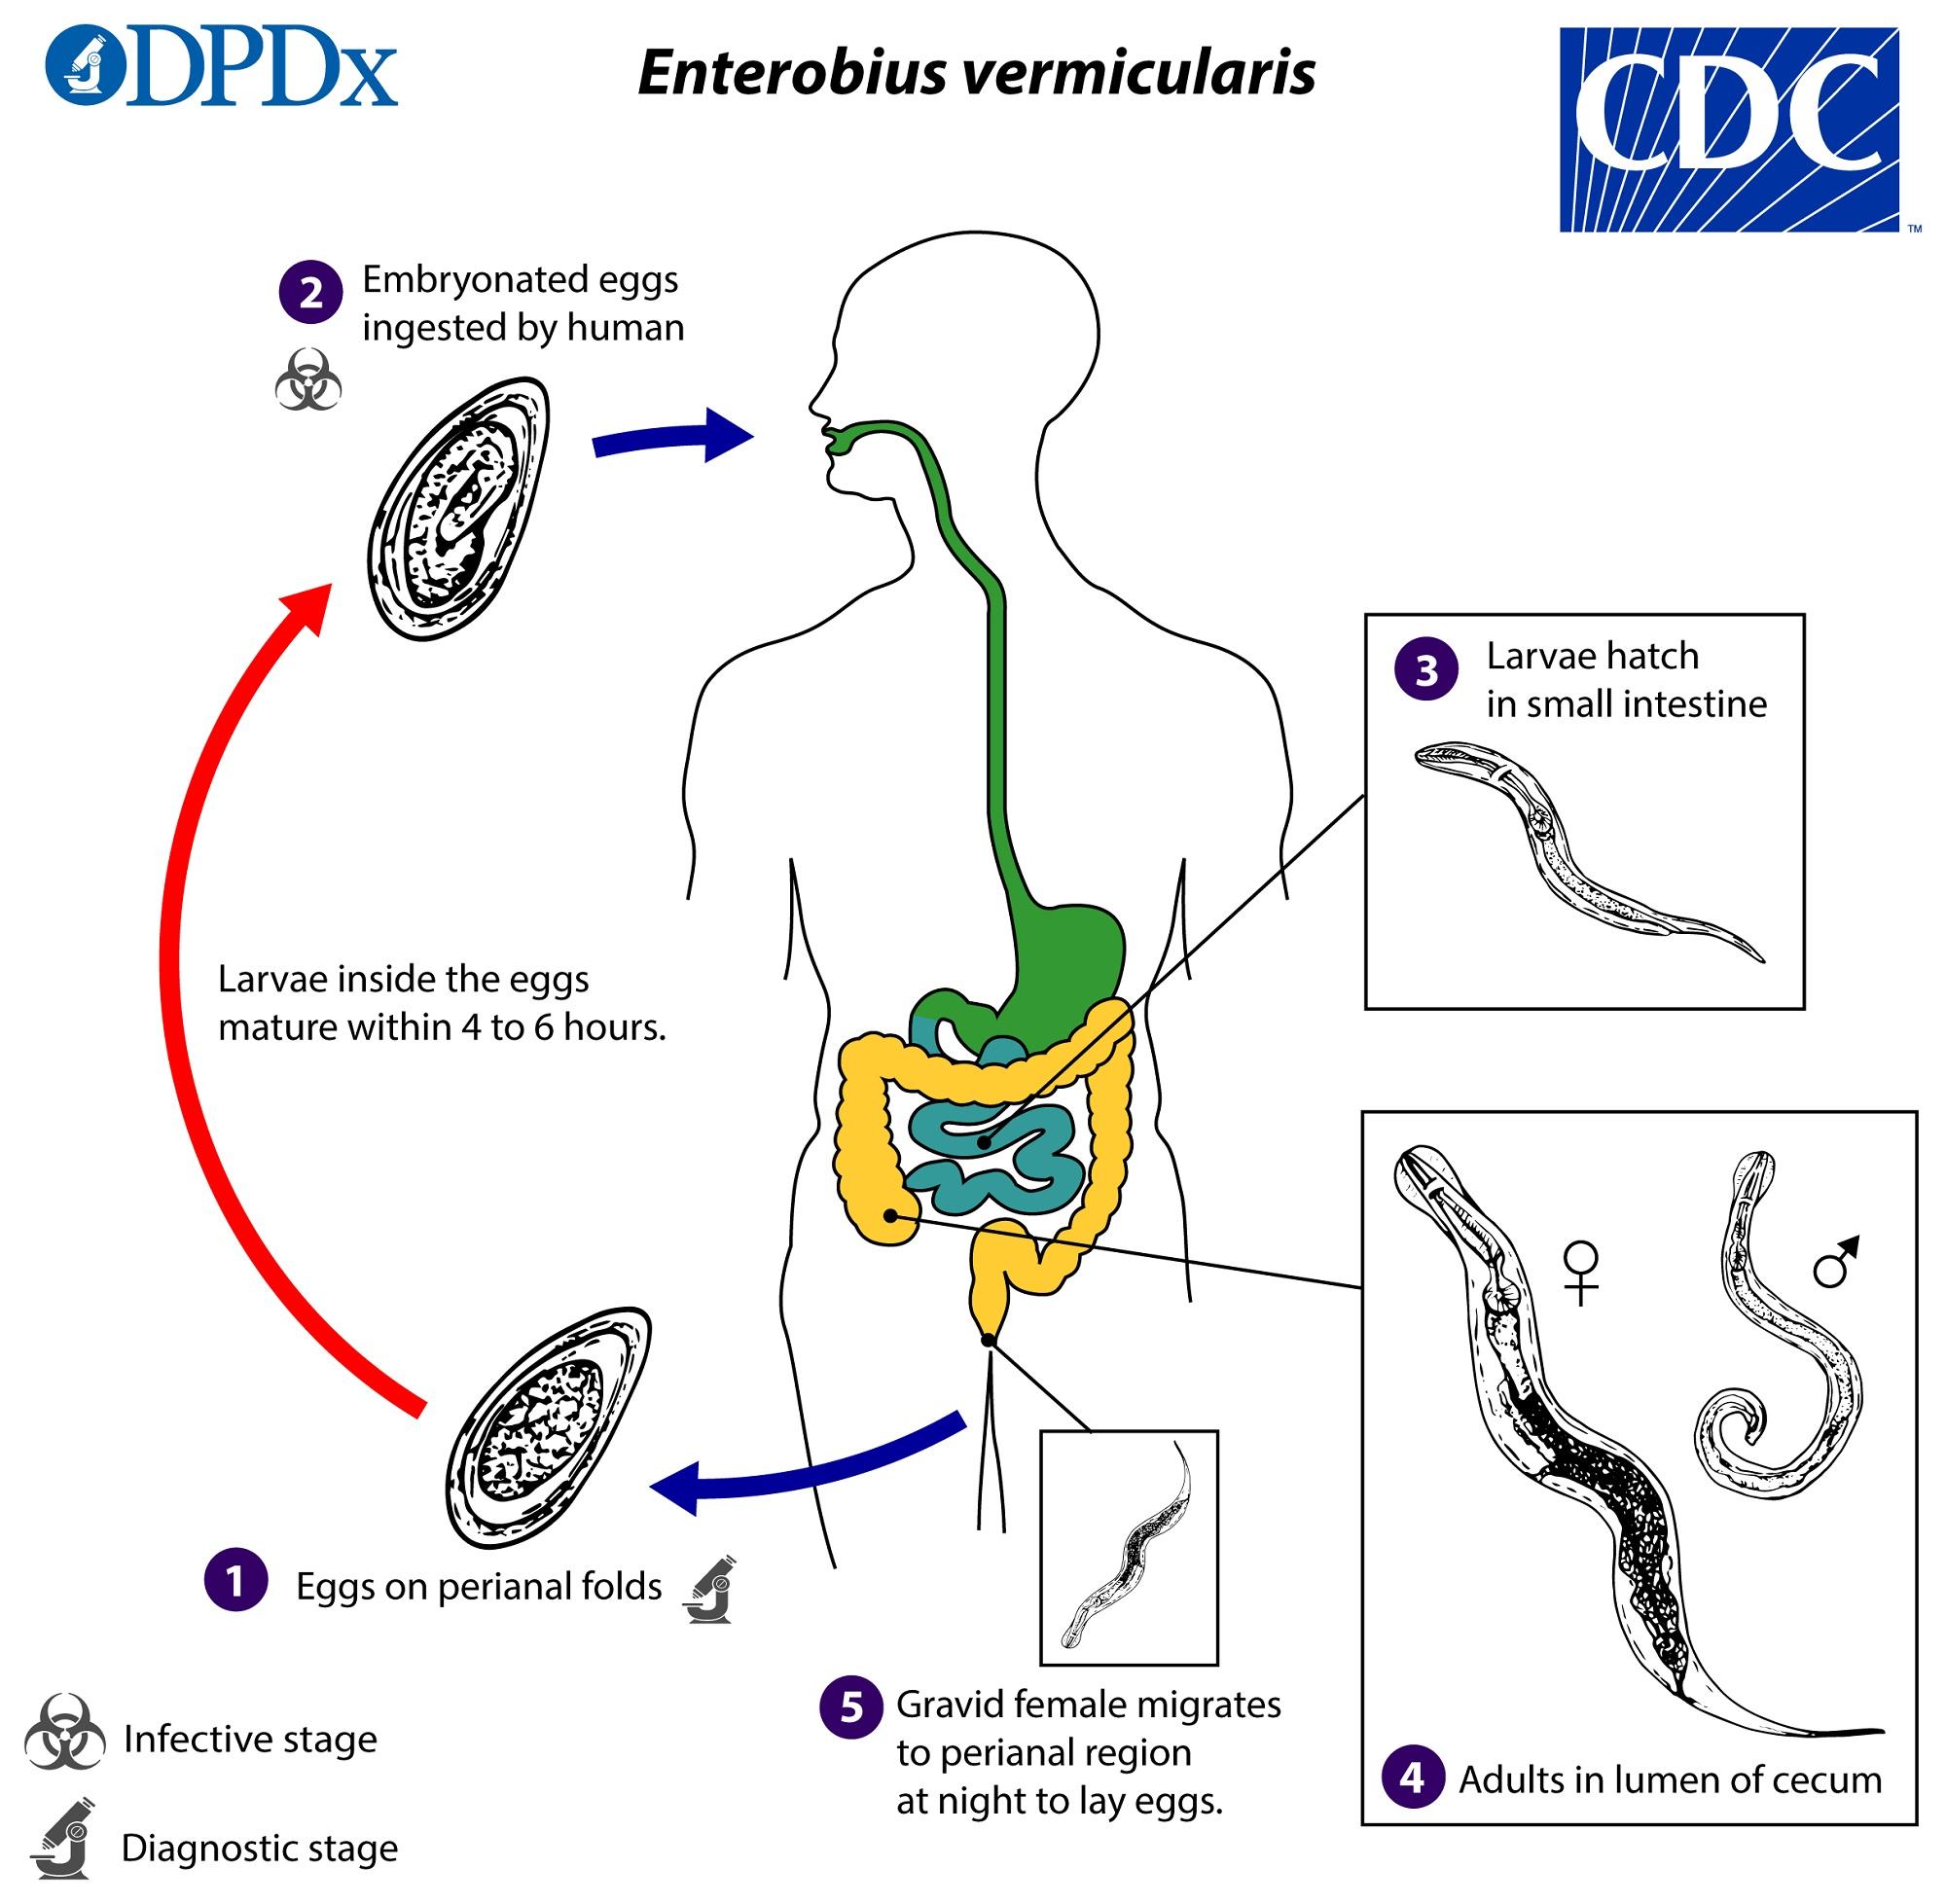 enterobius vermicularis végbél prolapsus mi az a galandféreg?